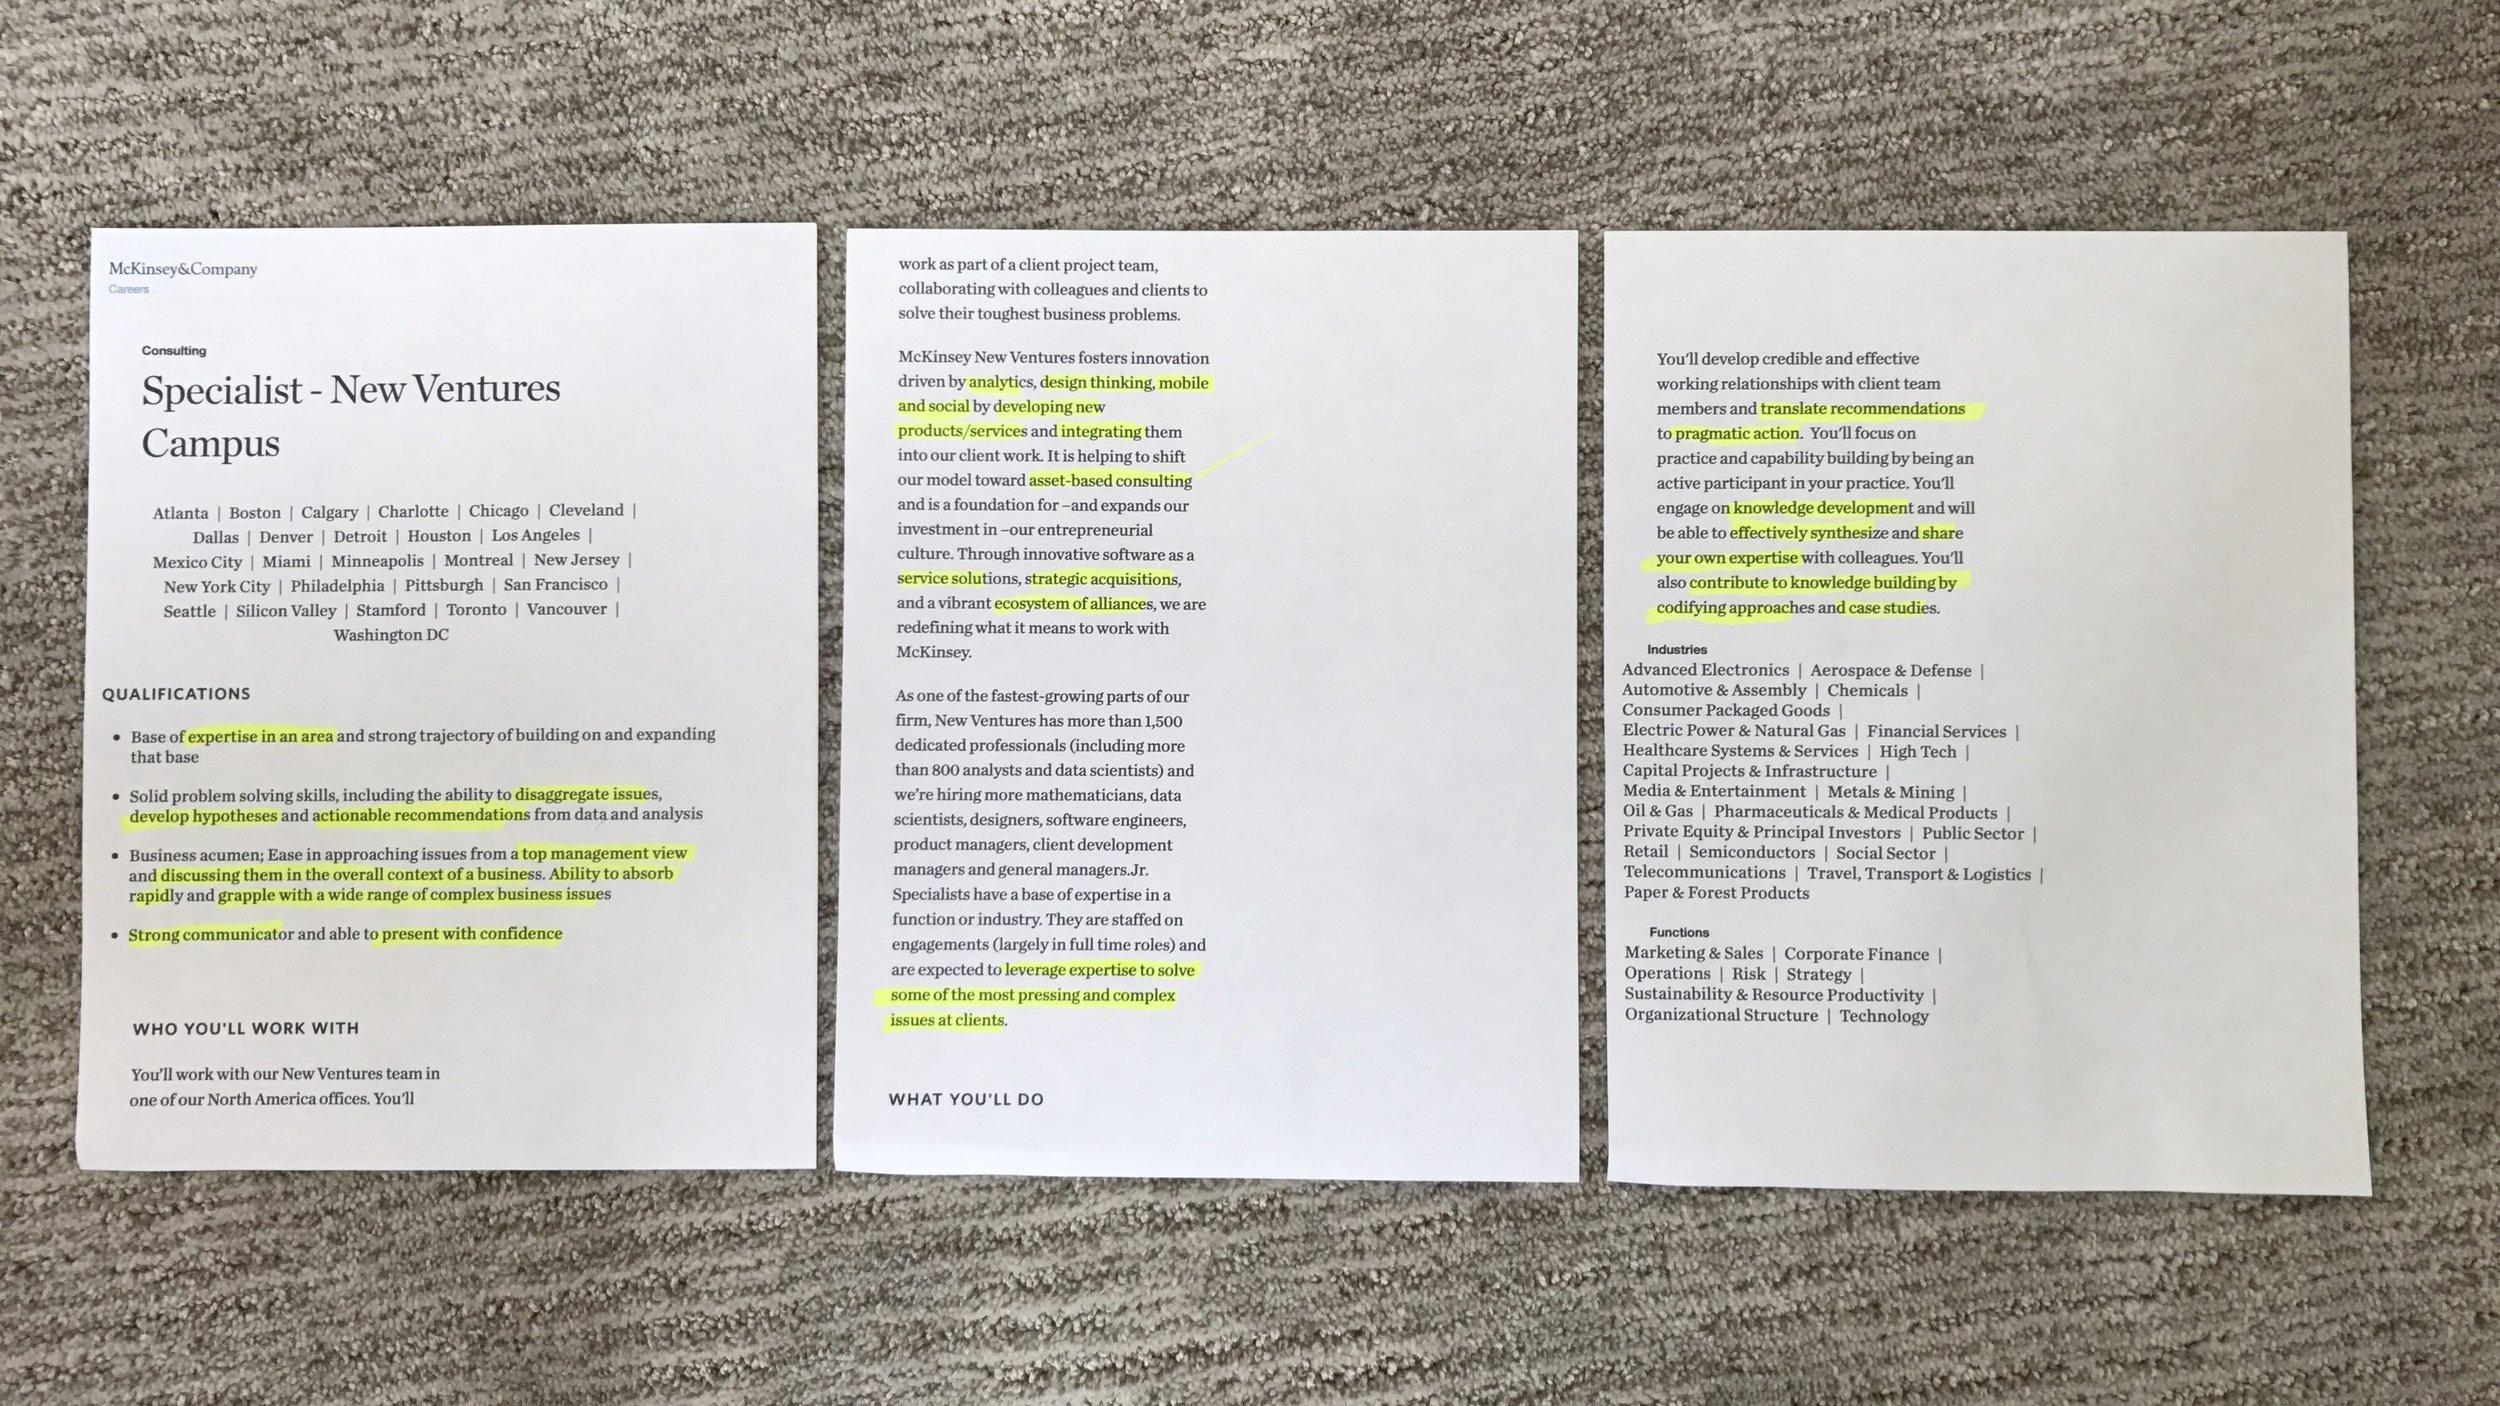 Document codifying